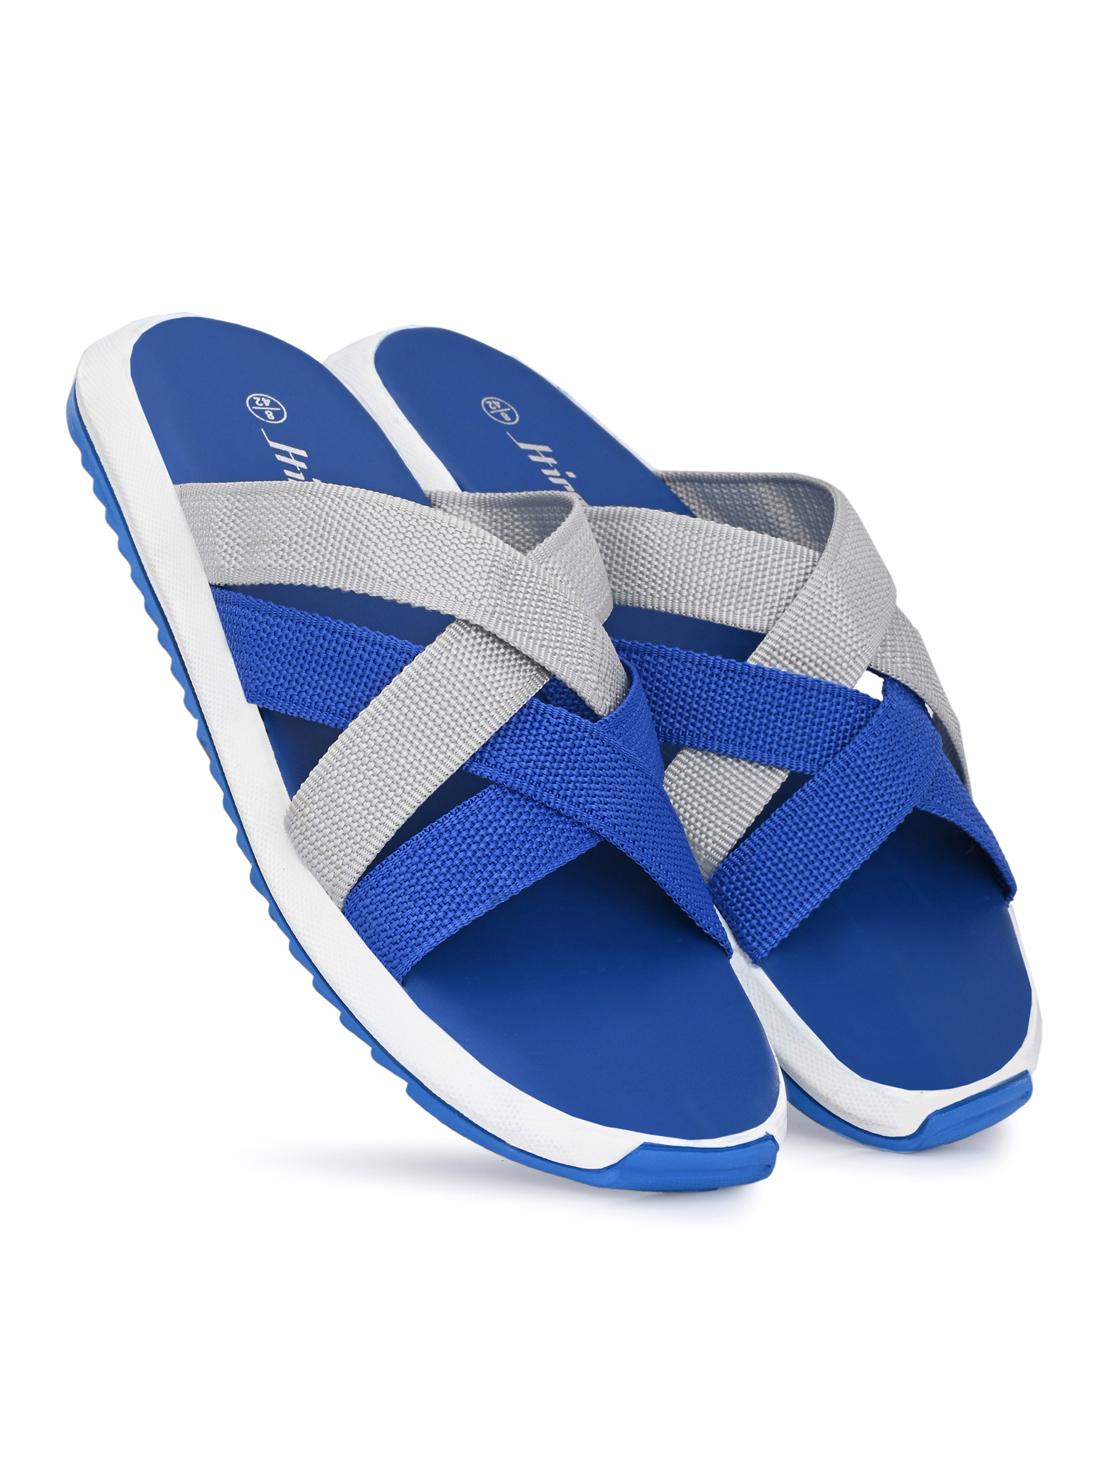 Hirolas | Hirolas® Men's Blue Strappy Flip-Flop Slider Slippers (UK6/EU40)